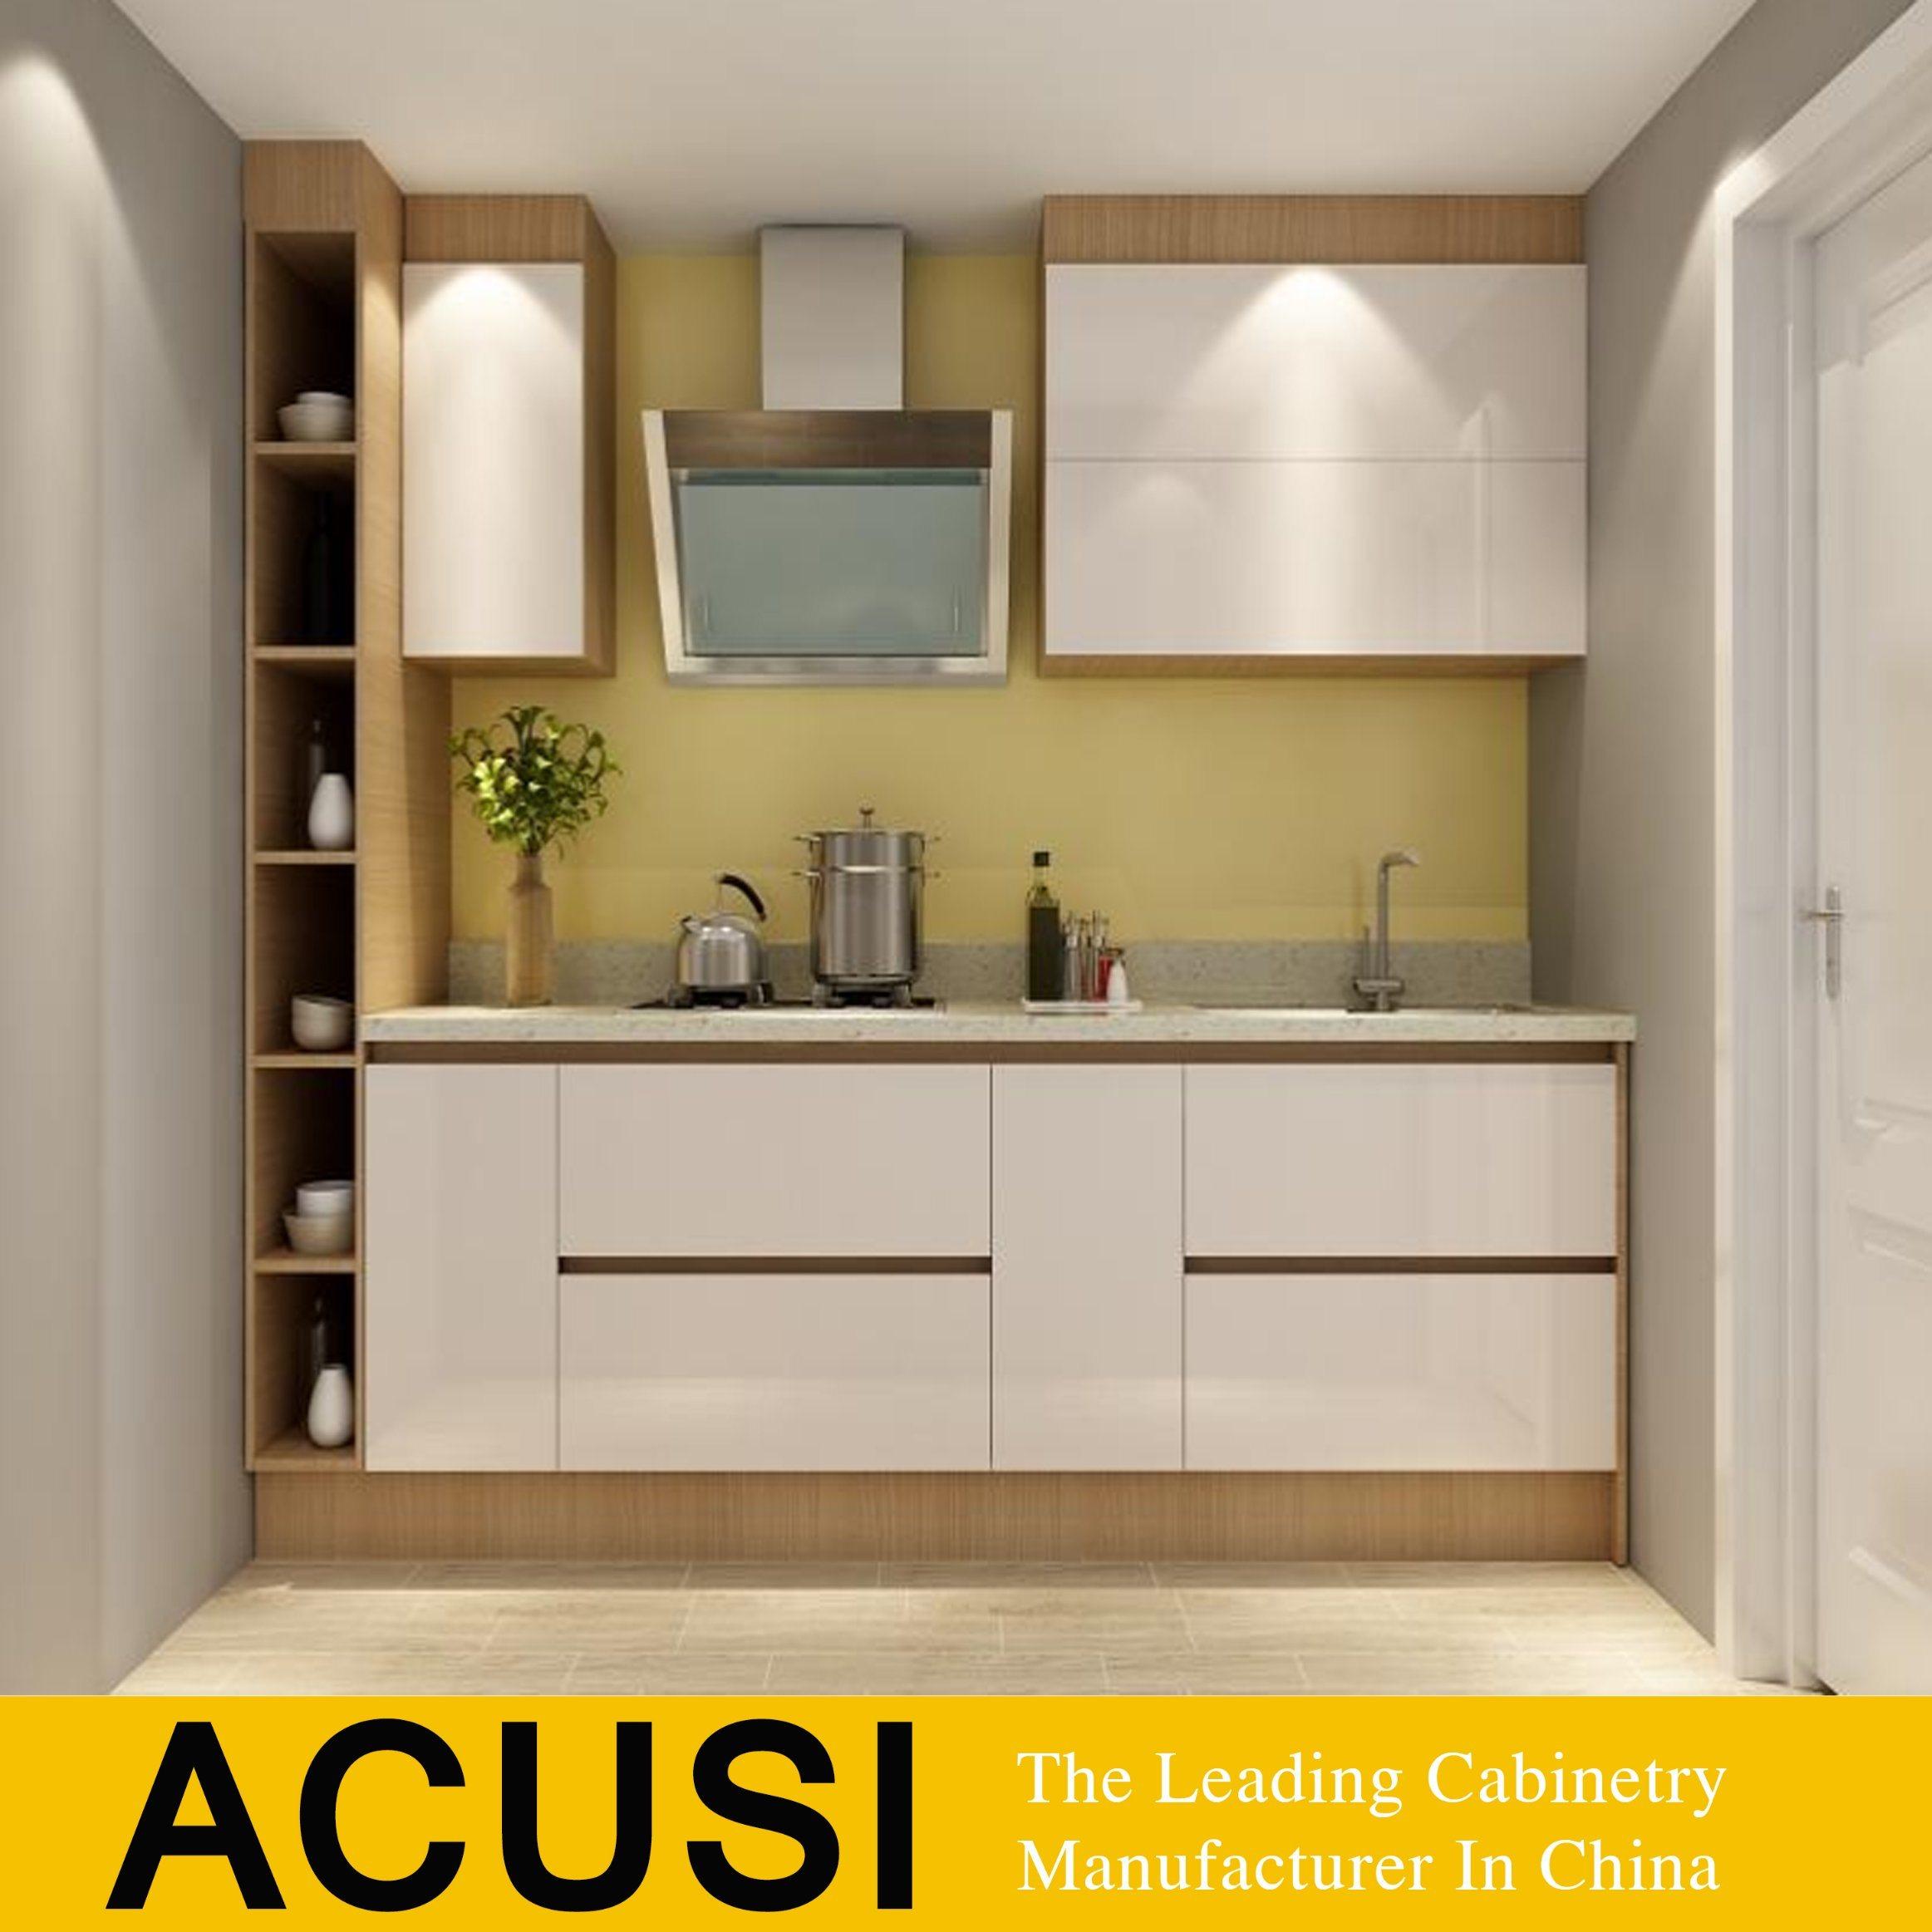 Hot Item Foshan Manufacturer 2 Pac Matte Lacquer Wholesale Modular Kitchen Cabinets Acs2 L164